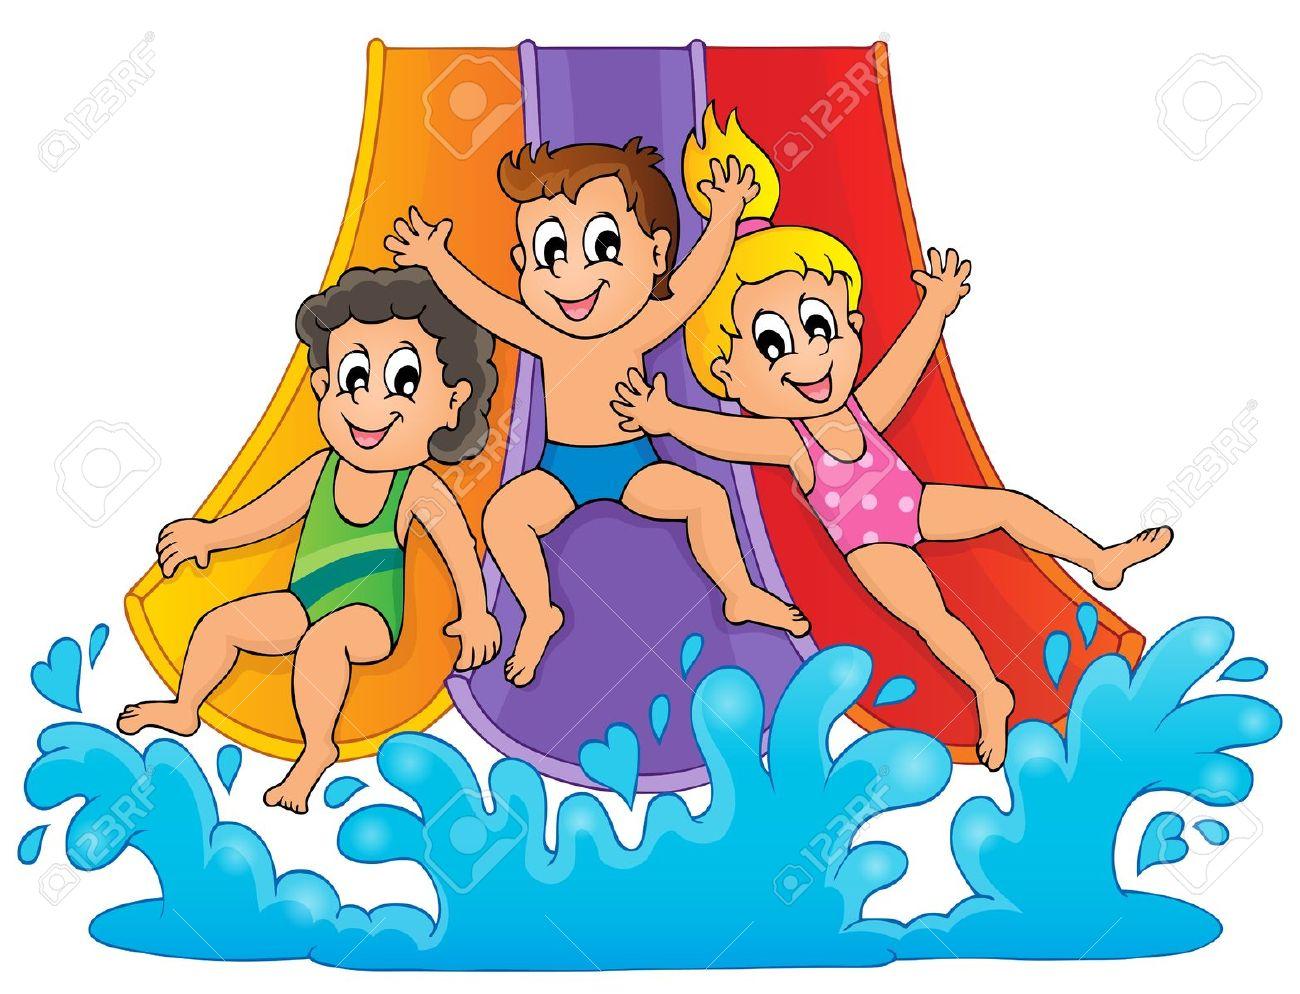 Waterpark: Image With Aqua Park Theme Il-waterpark: Image with aqua park theme Illustration-19